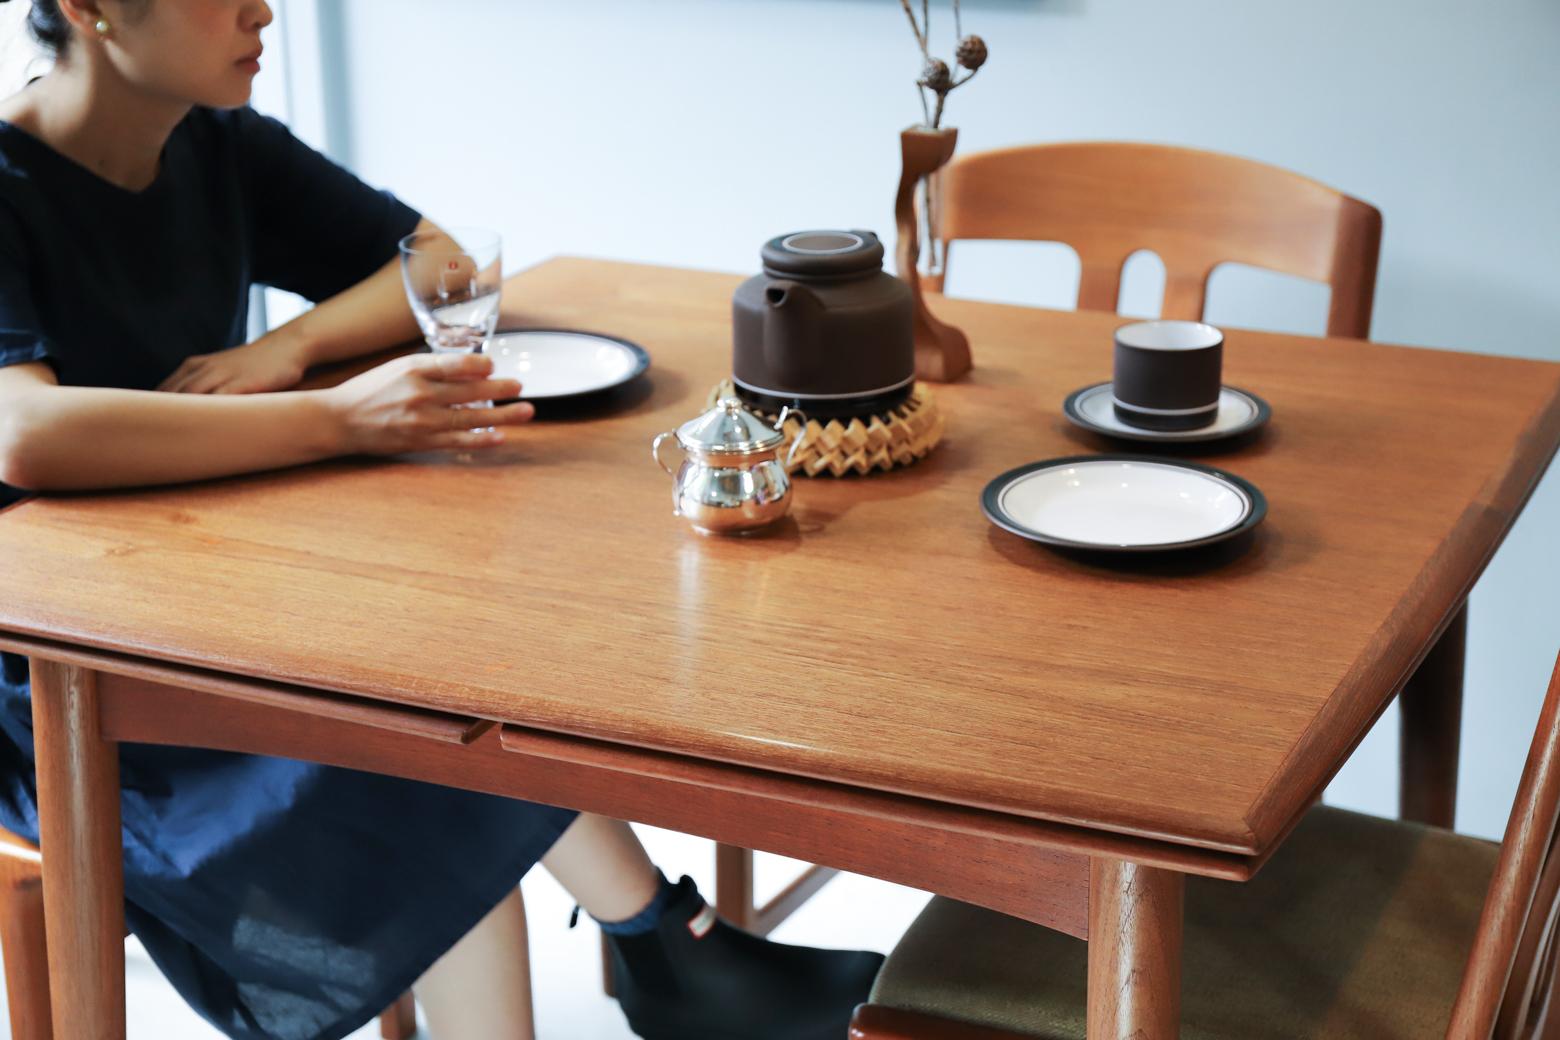 Danish Vintage Extending Dining Table/デンマーク ヴィンテージ エクステンション ダイニング テーブル 北欧家具